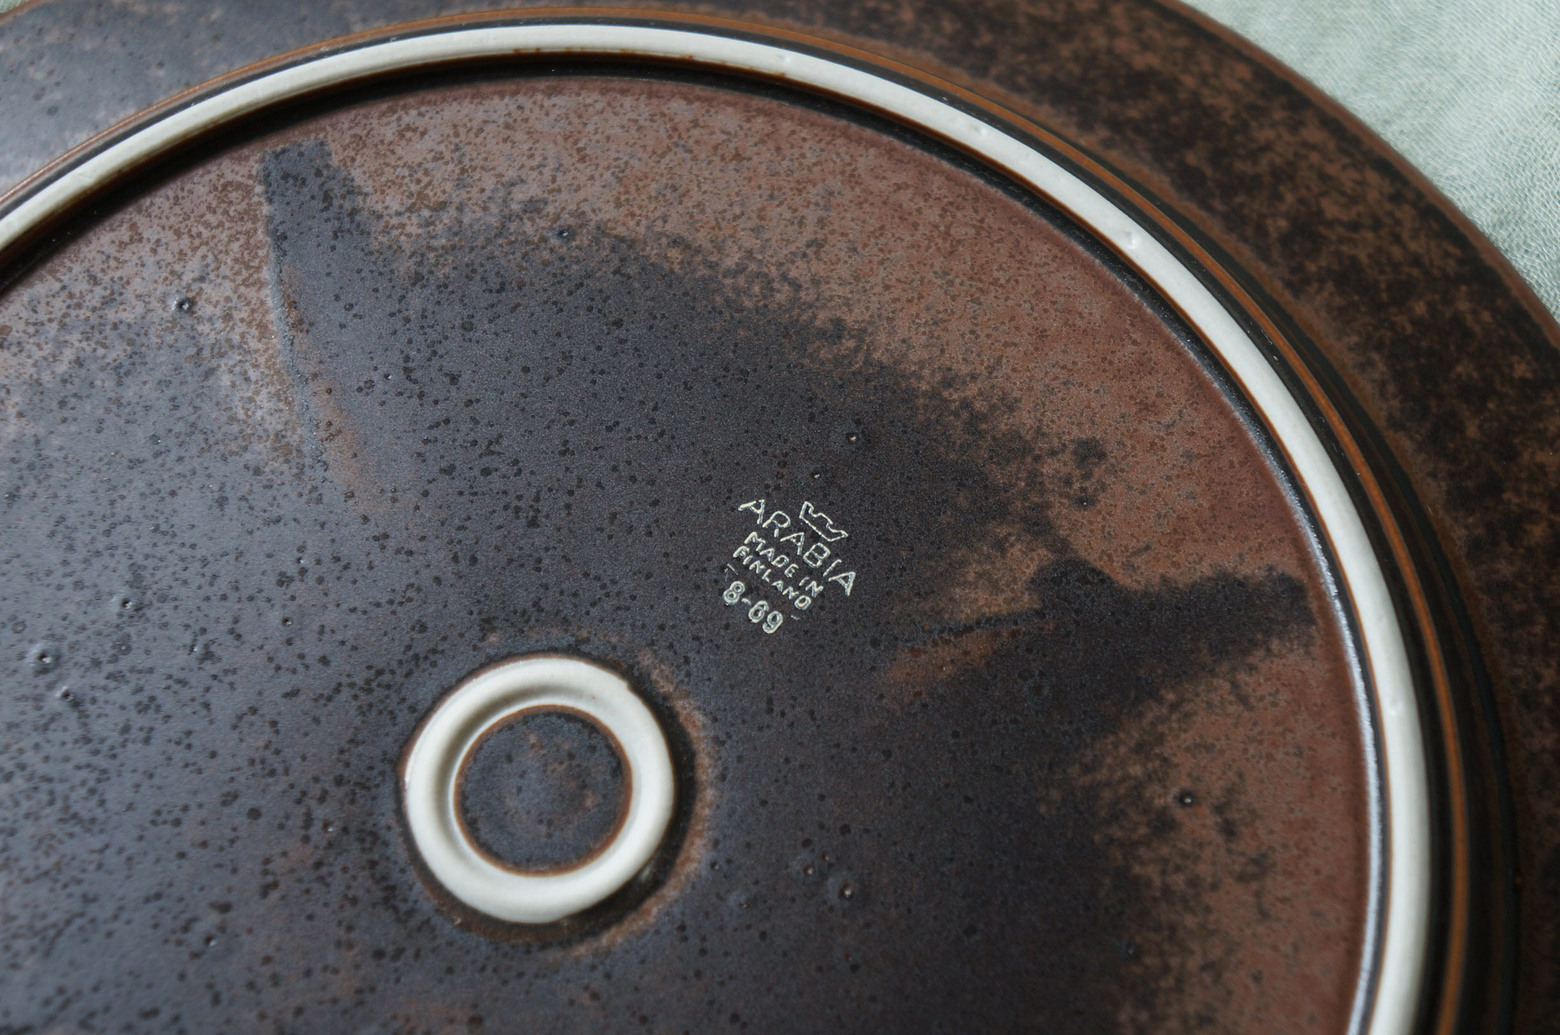 ARABIA Ruska Dinner Plate 25.5cm Ulla Procope/アラビア ルスカ ディナープレート ウラ・プロコッペ フィンランド ヴィンテージ 北欧食器 1